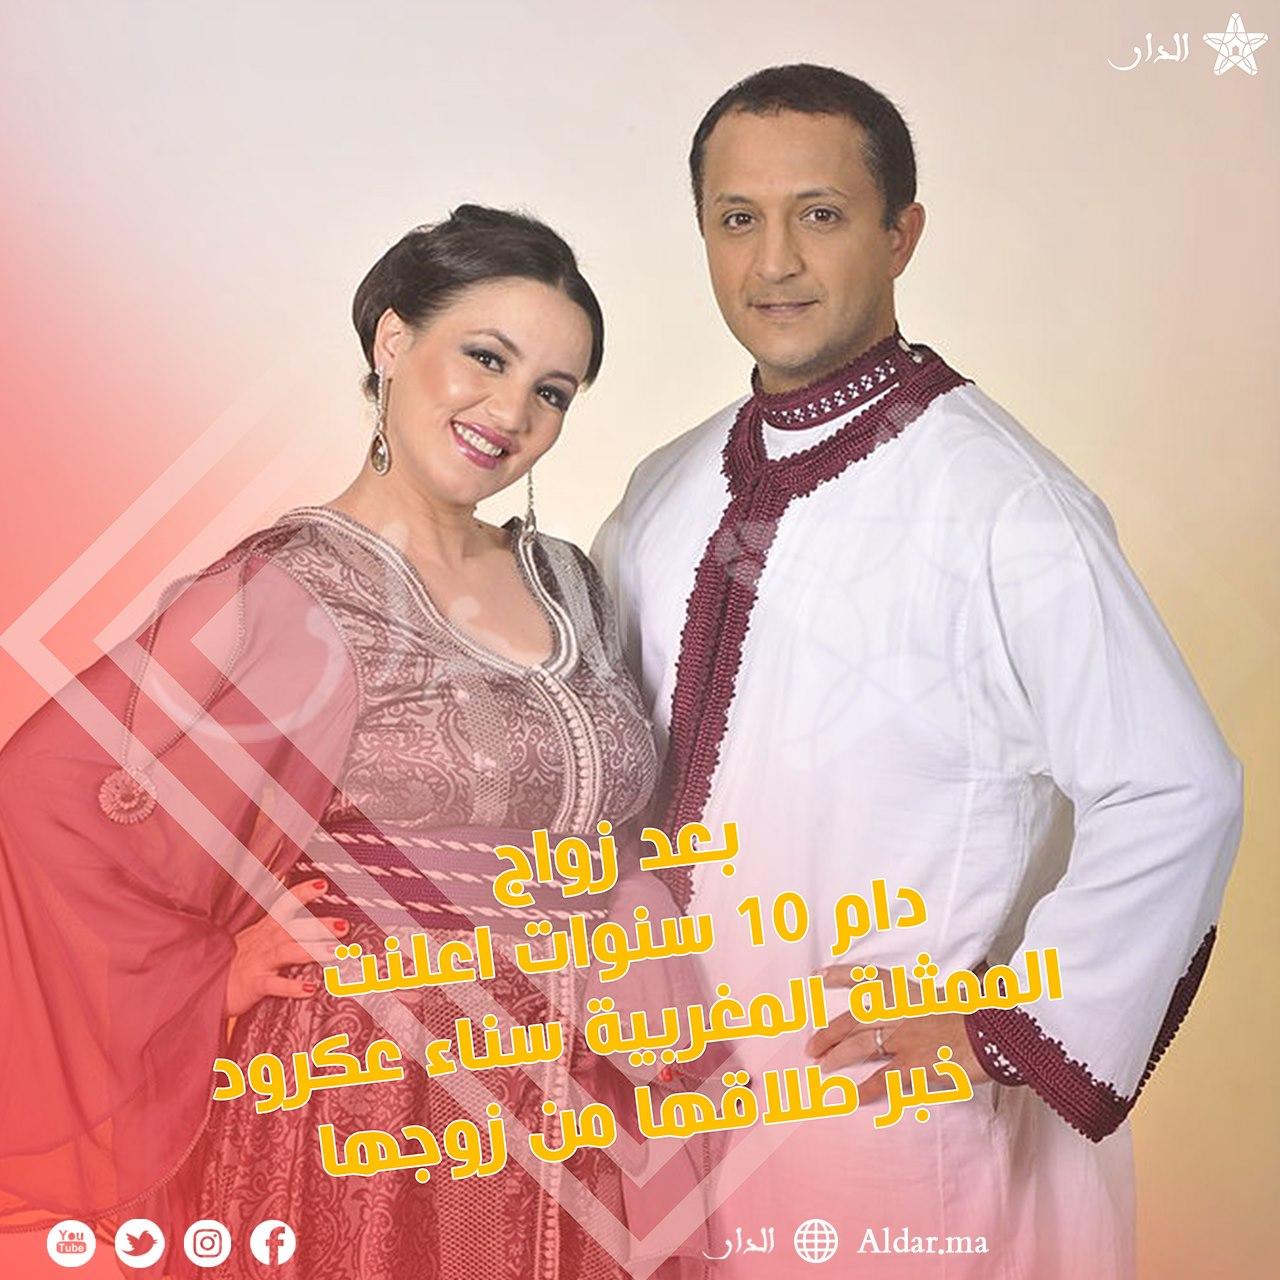 Photo of بالتفاصيل.. سناء عكرود تصدم جمهورها بهذا الخبر